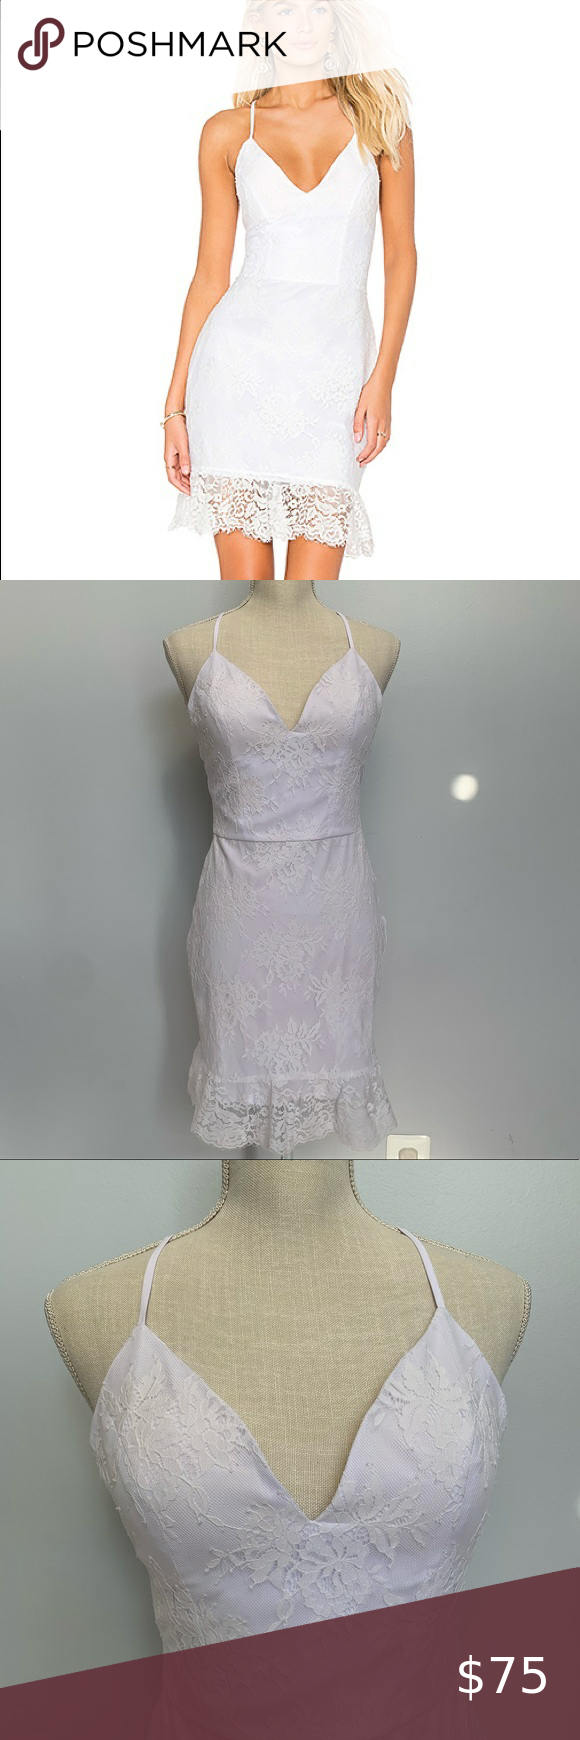 Bobi White Lace Mini Dress Nwt In 2021 White Lace Mini Dress Lace Mini Dress Mini Dress [ 1740 x 580 Pixel ]